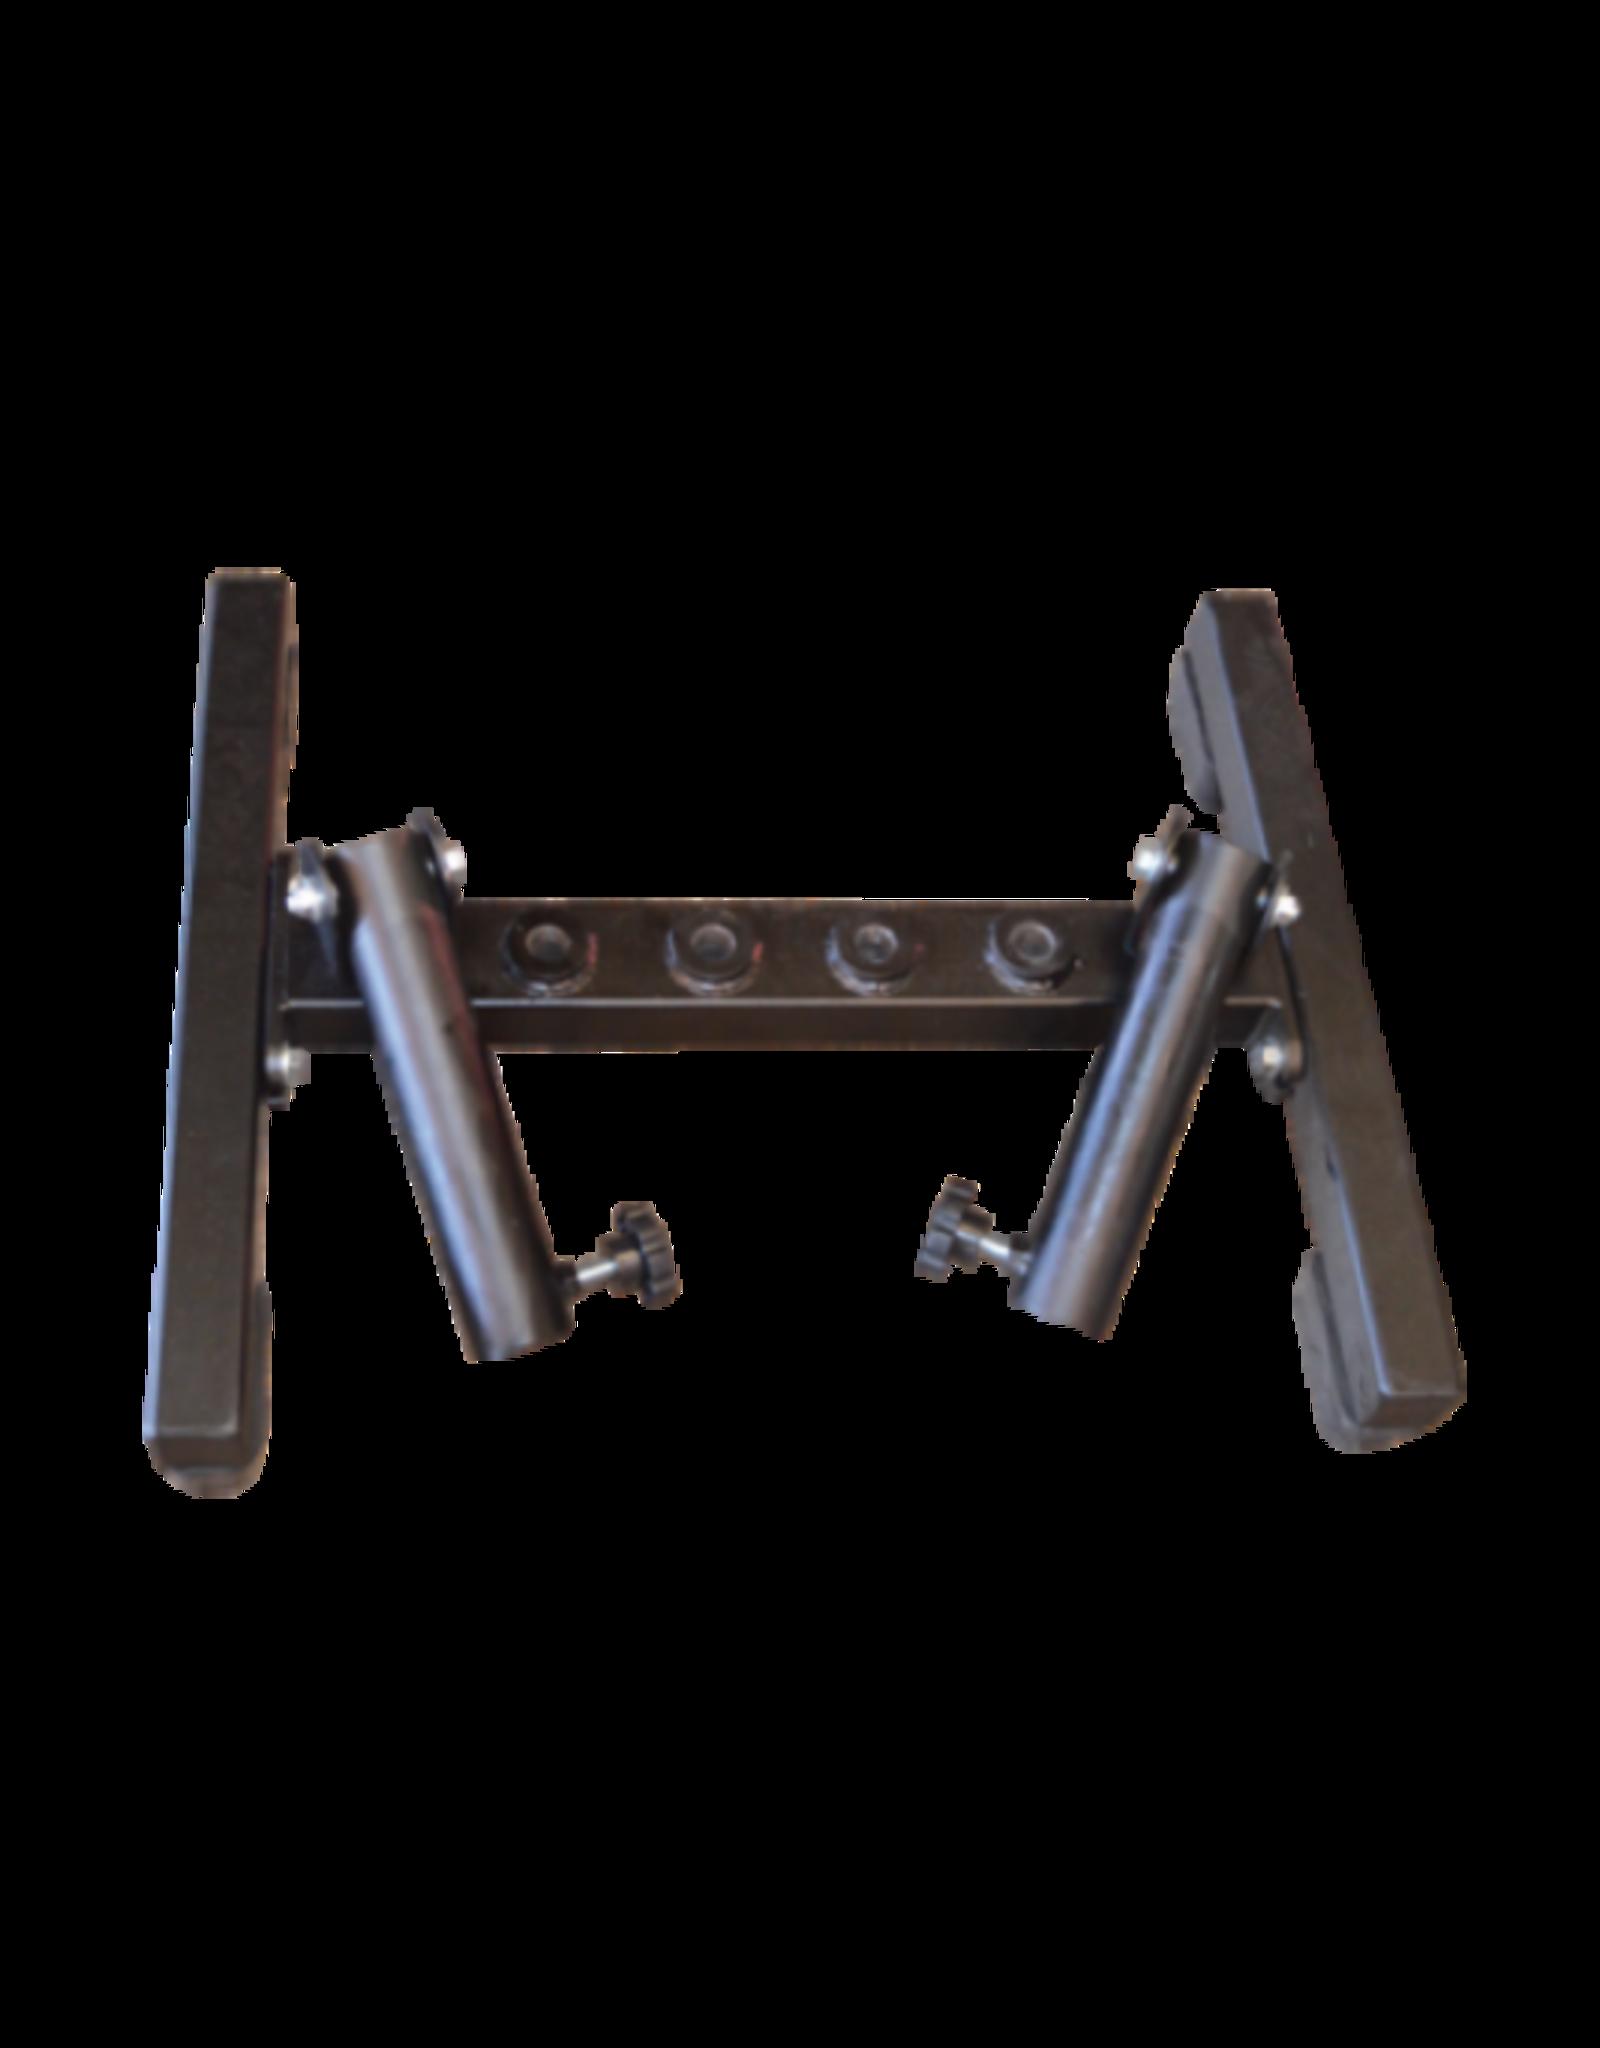 PROMAXIMA PROMAXIMA - 2 bar swivel - Landmine